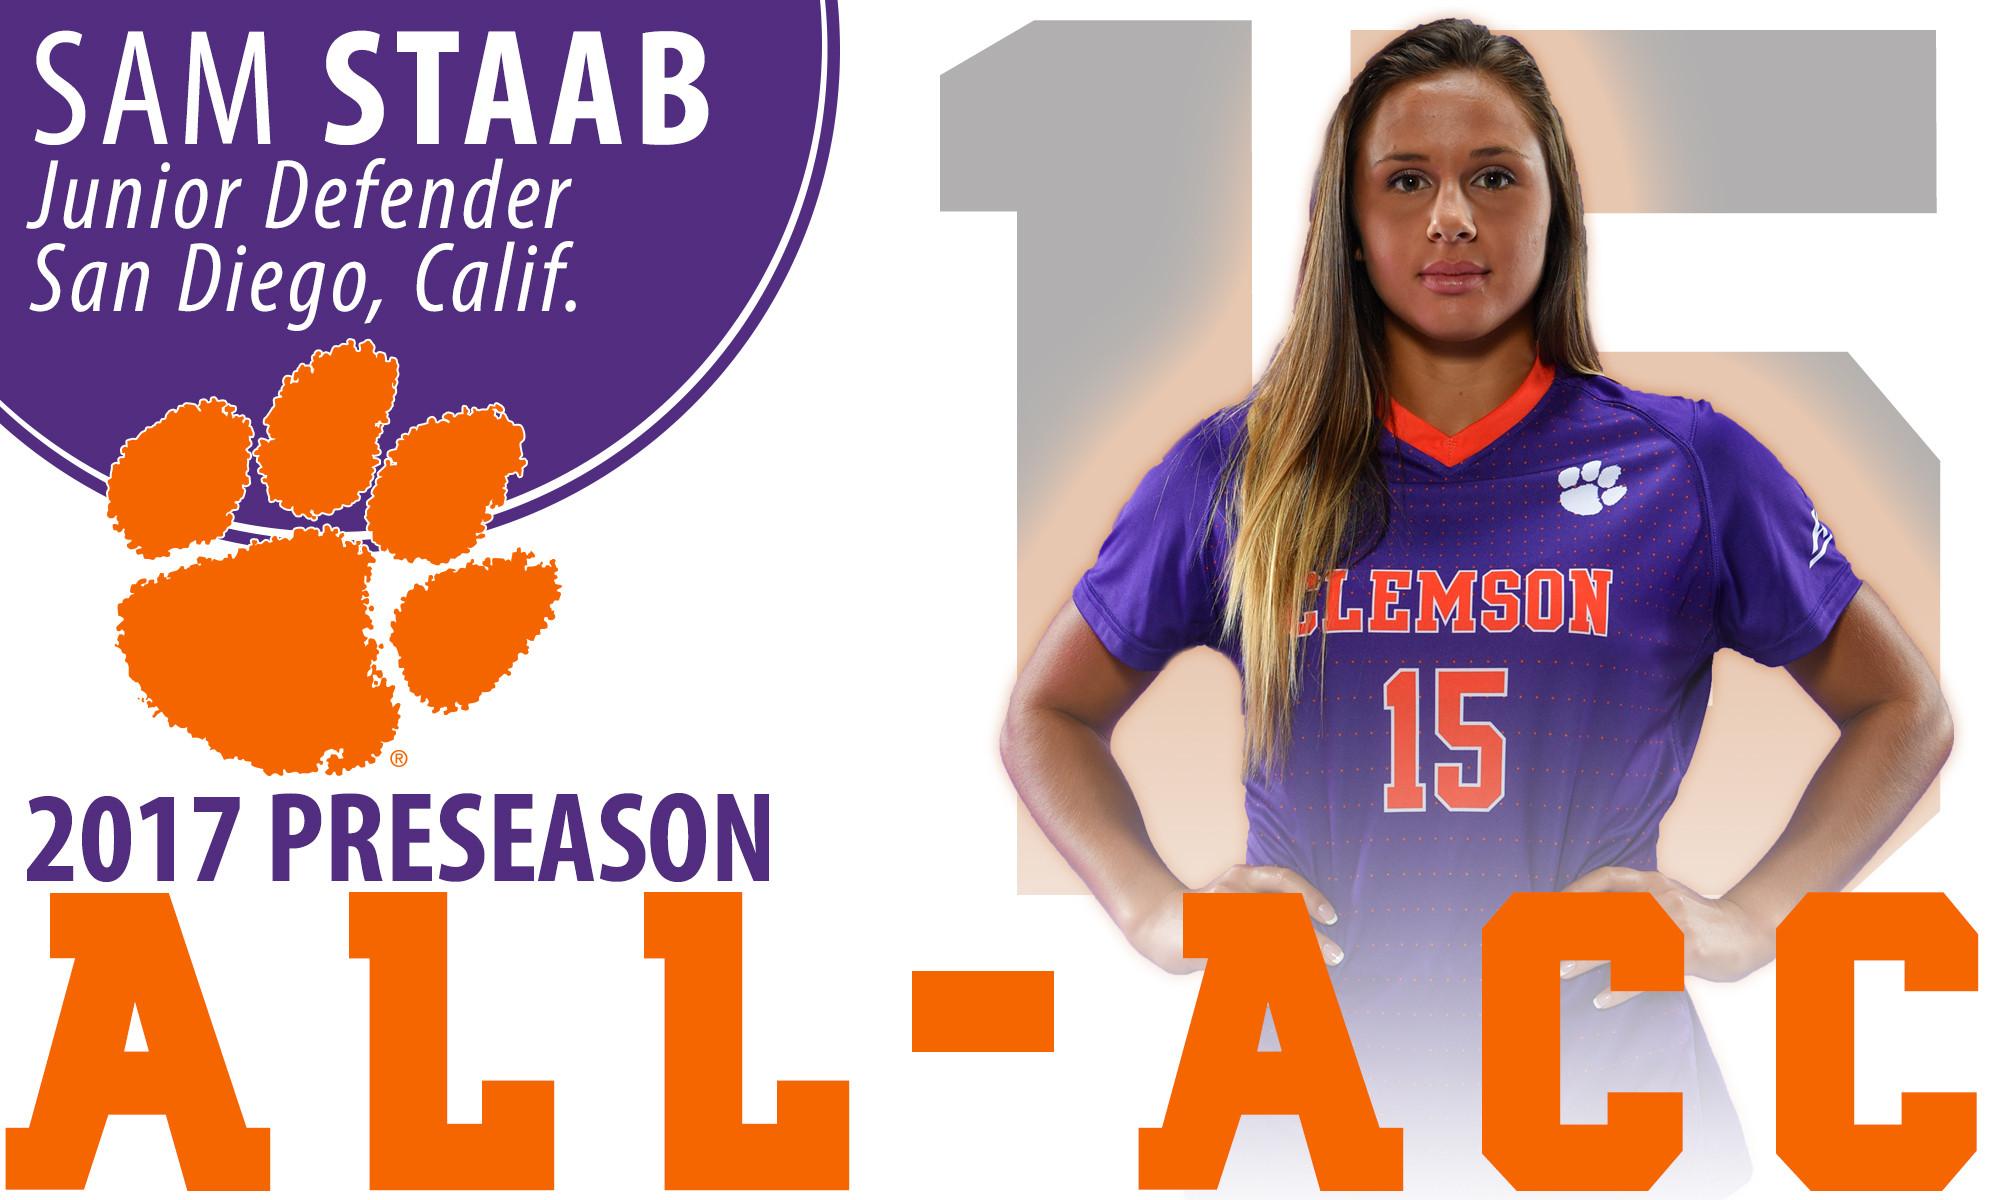 Staab Named to 2017 Preseason All-ACC Team